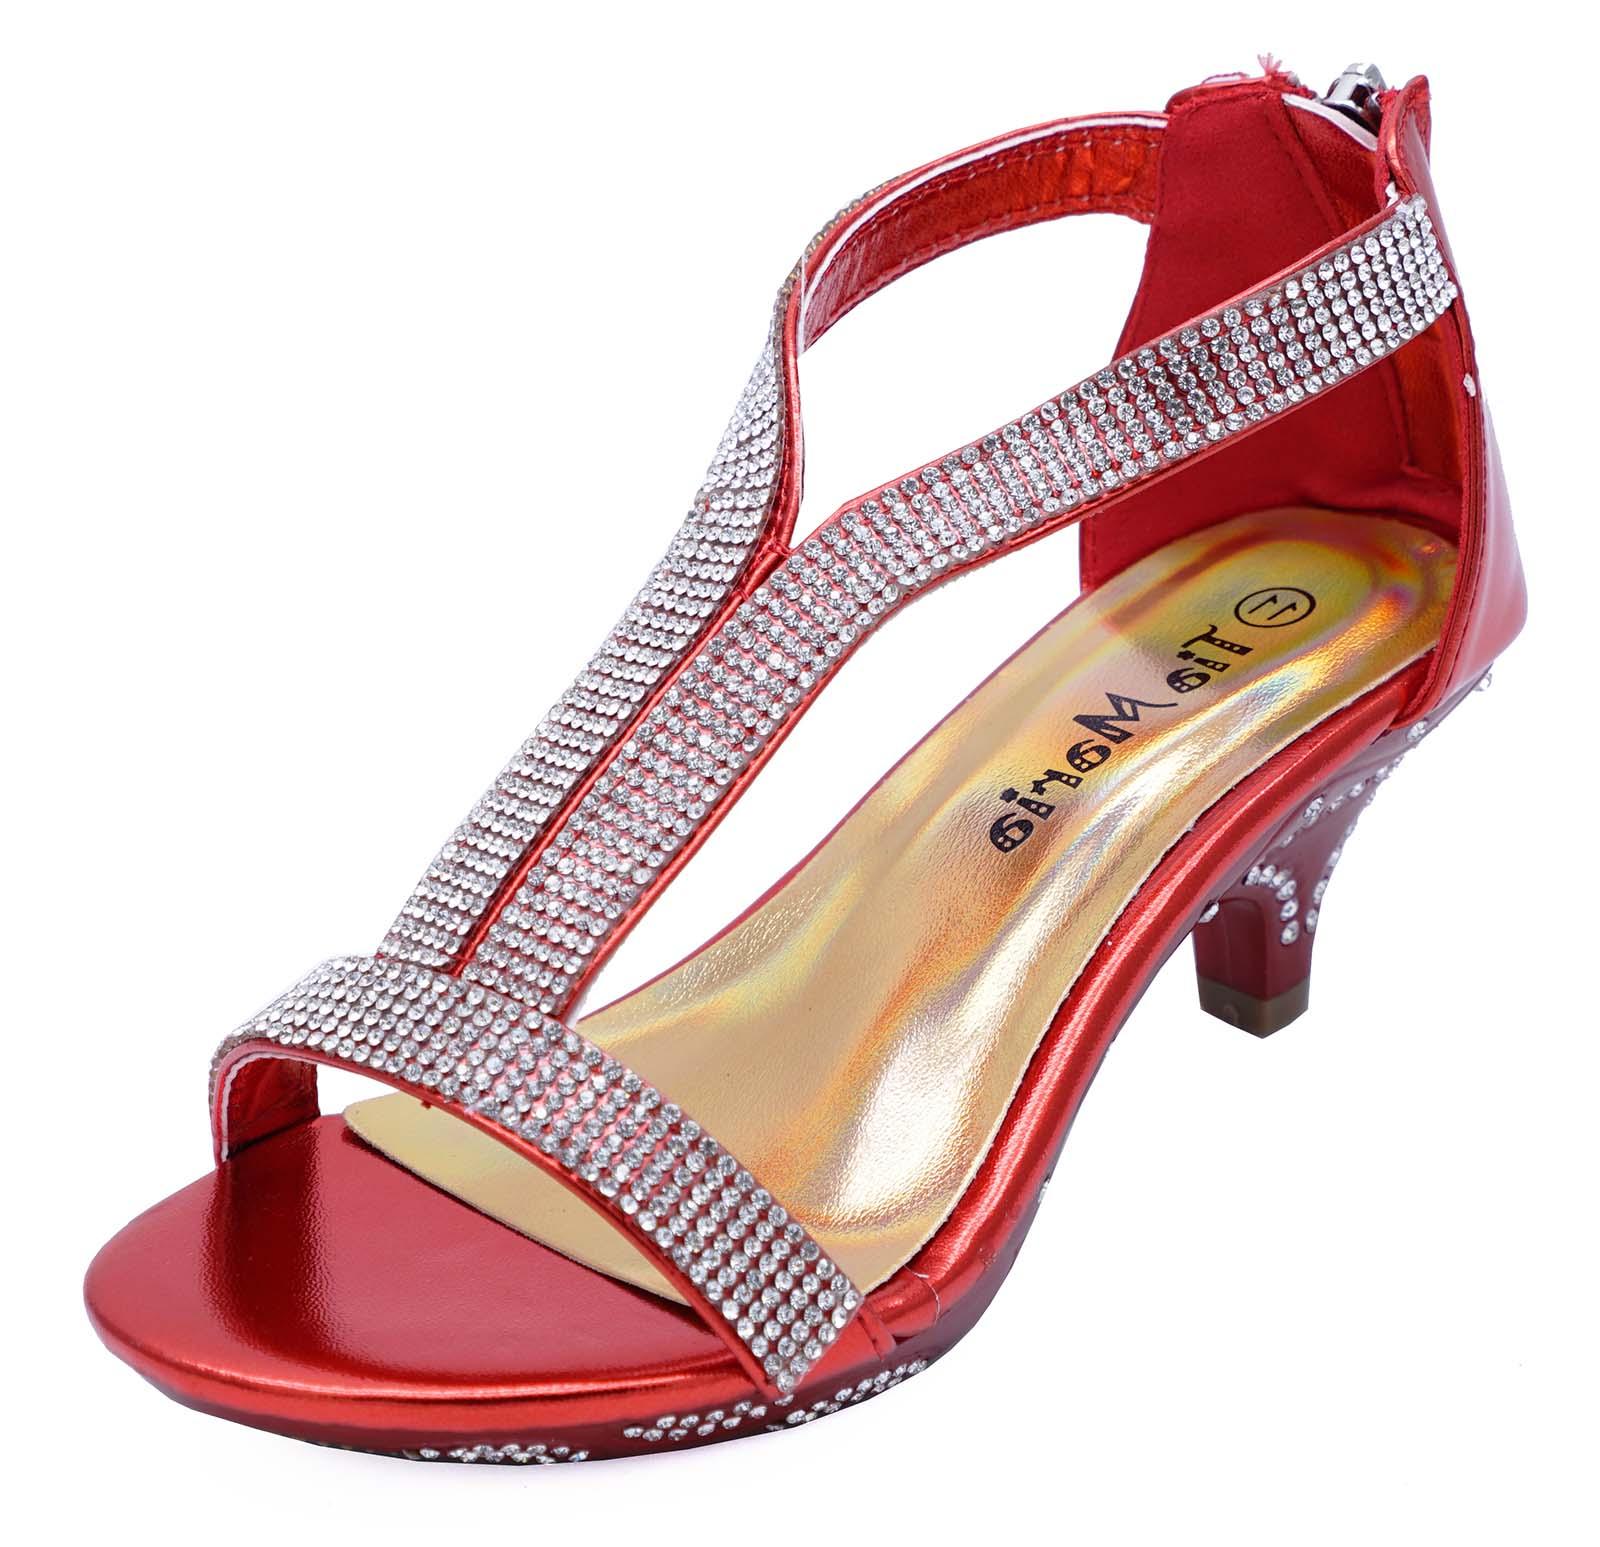 GIRLS CHILDRENS RED T-BAR PEEPTOE DIAMANTE LOW-HEEL SANDALS DRESS SHOES 10-2